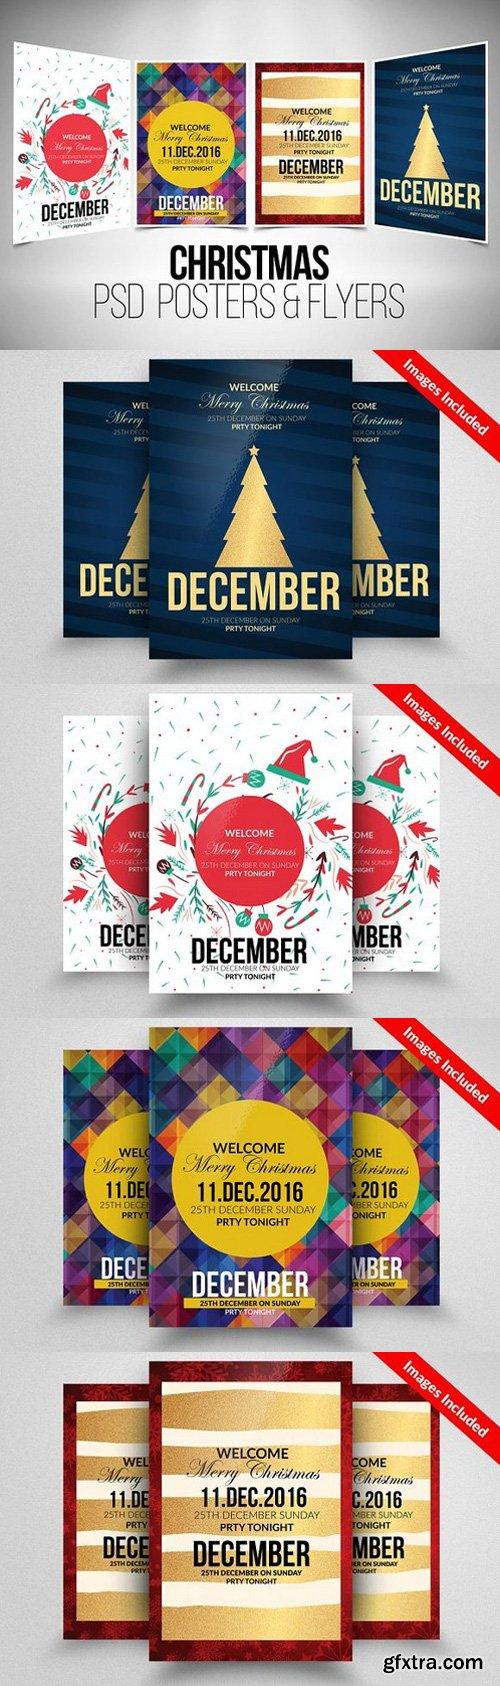 CM - 4 Christmas Flyer Template Bundle 928716